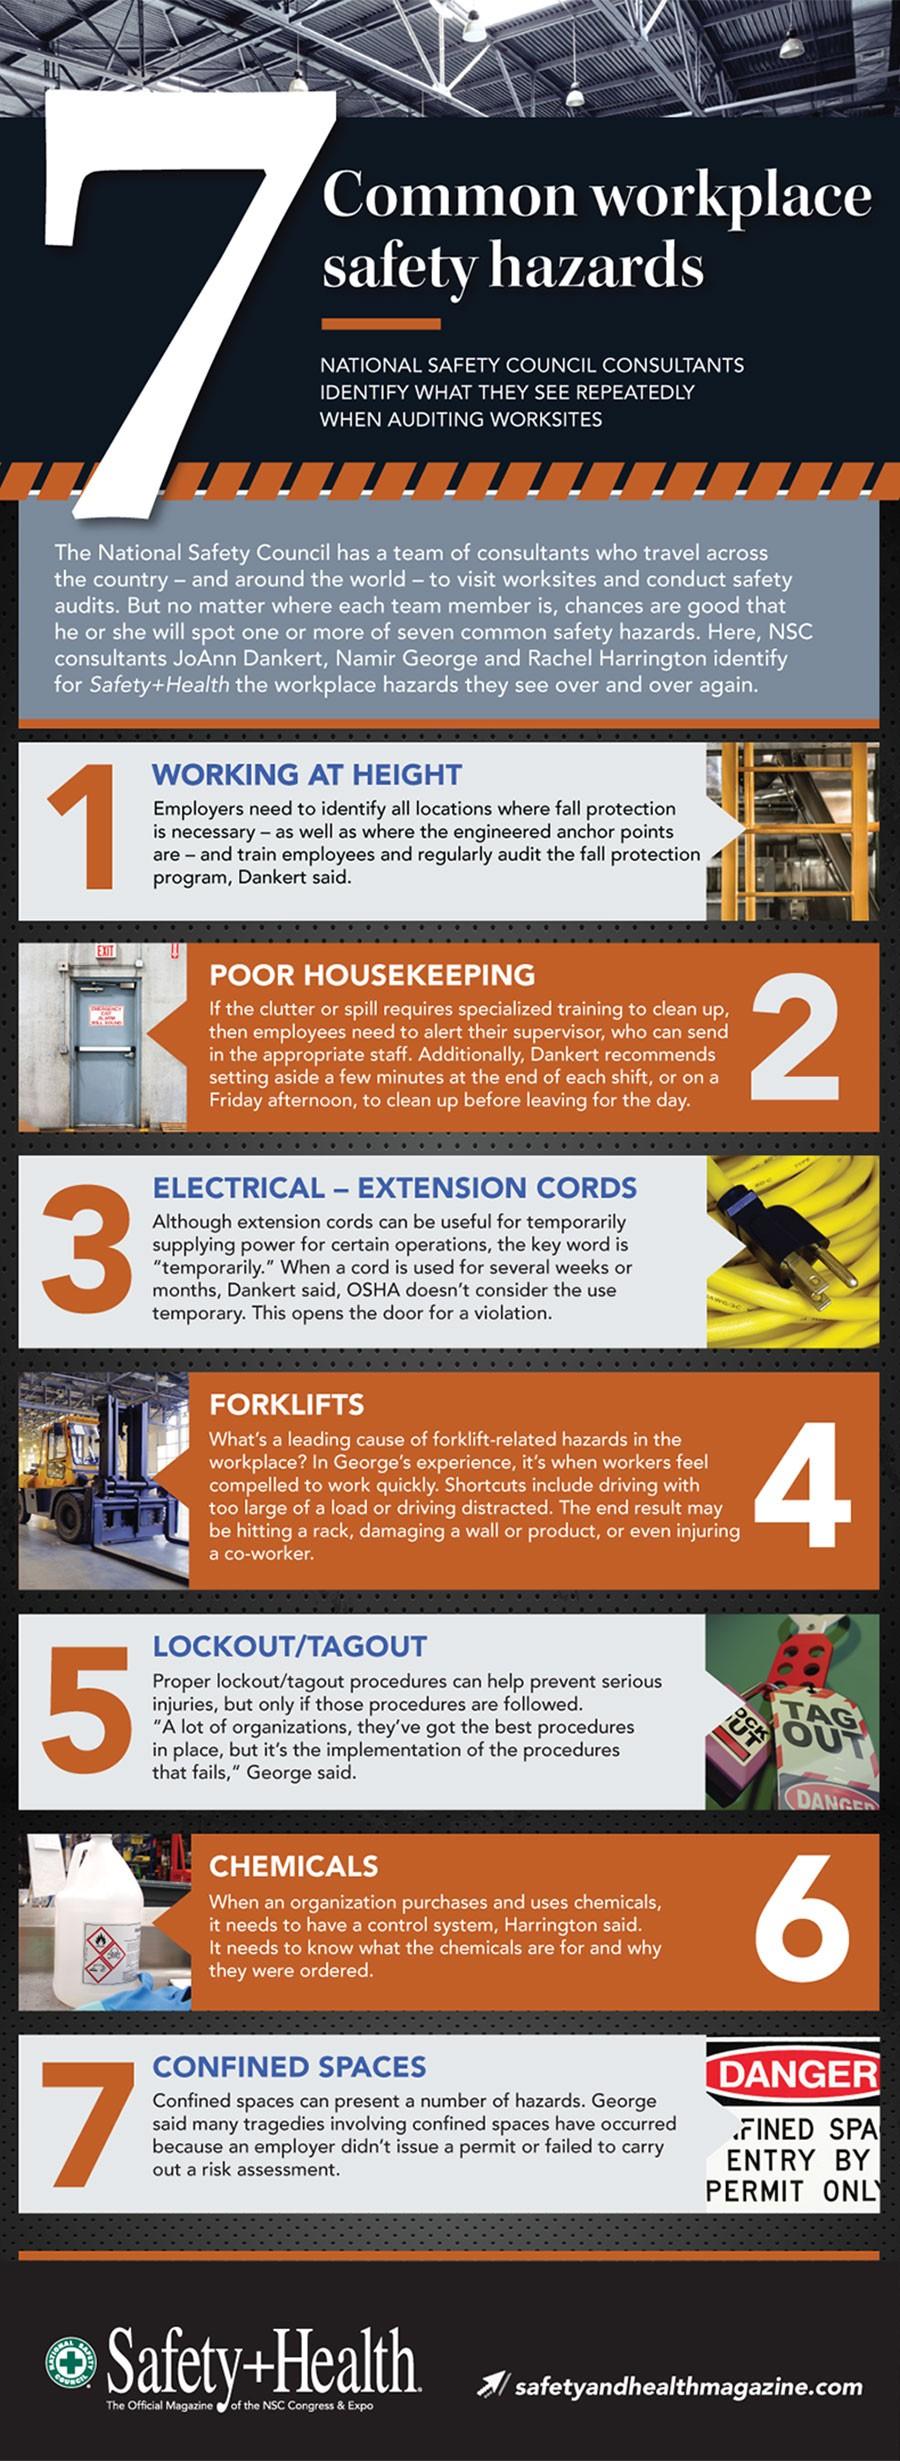 7 Common Workplace Safety Hazards - Atlantictraining.com